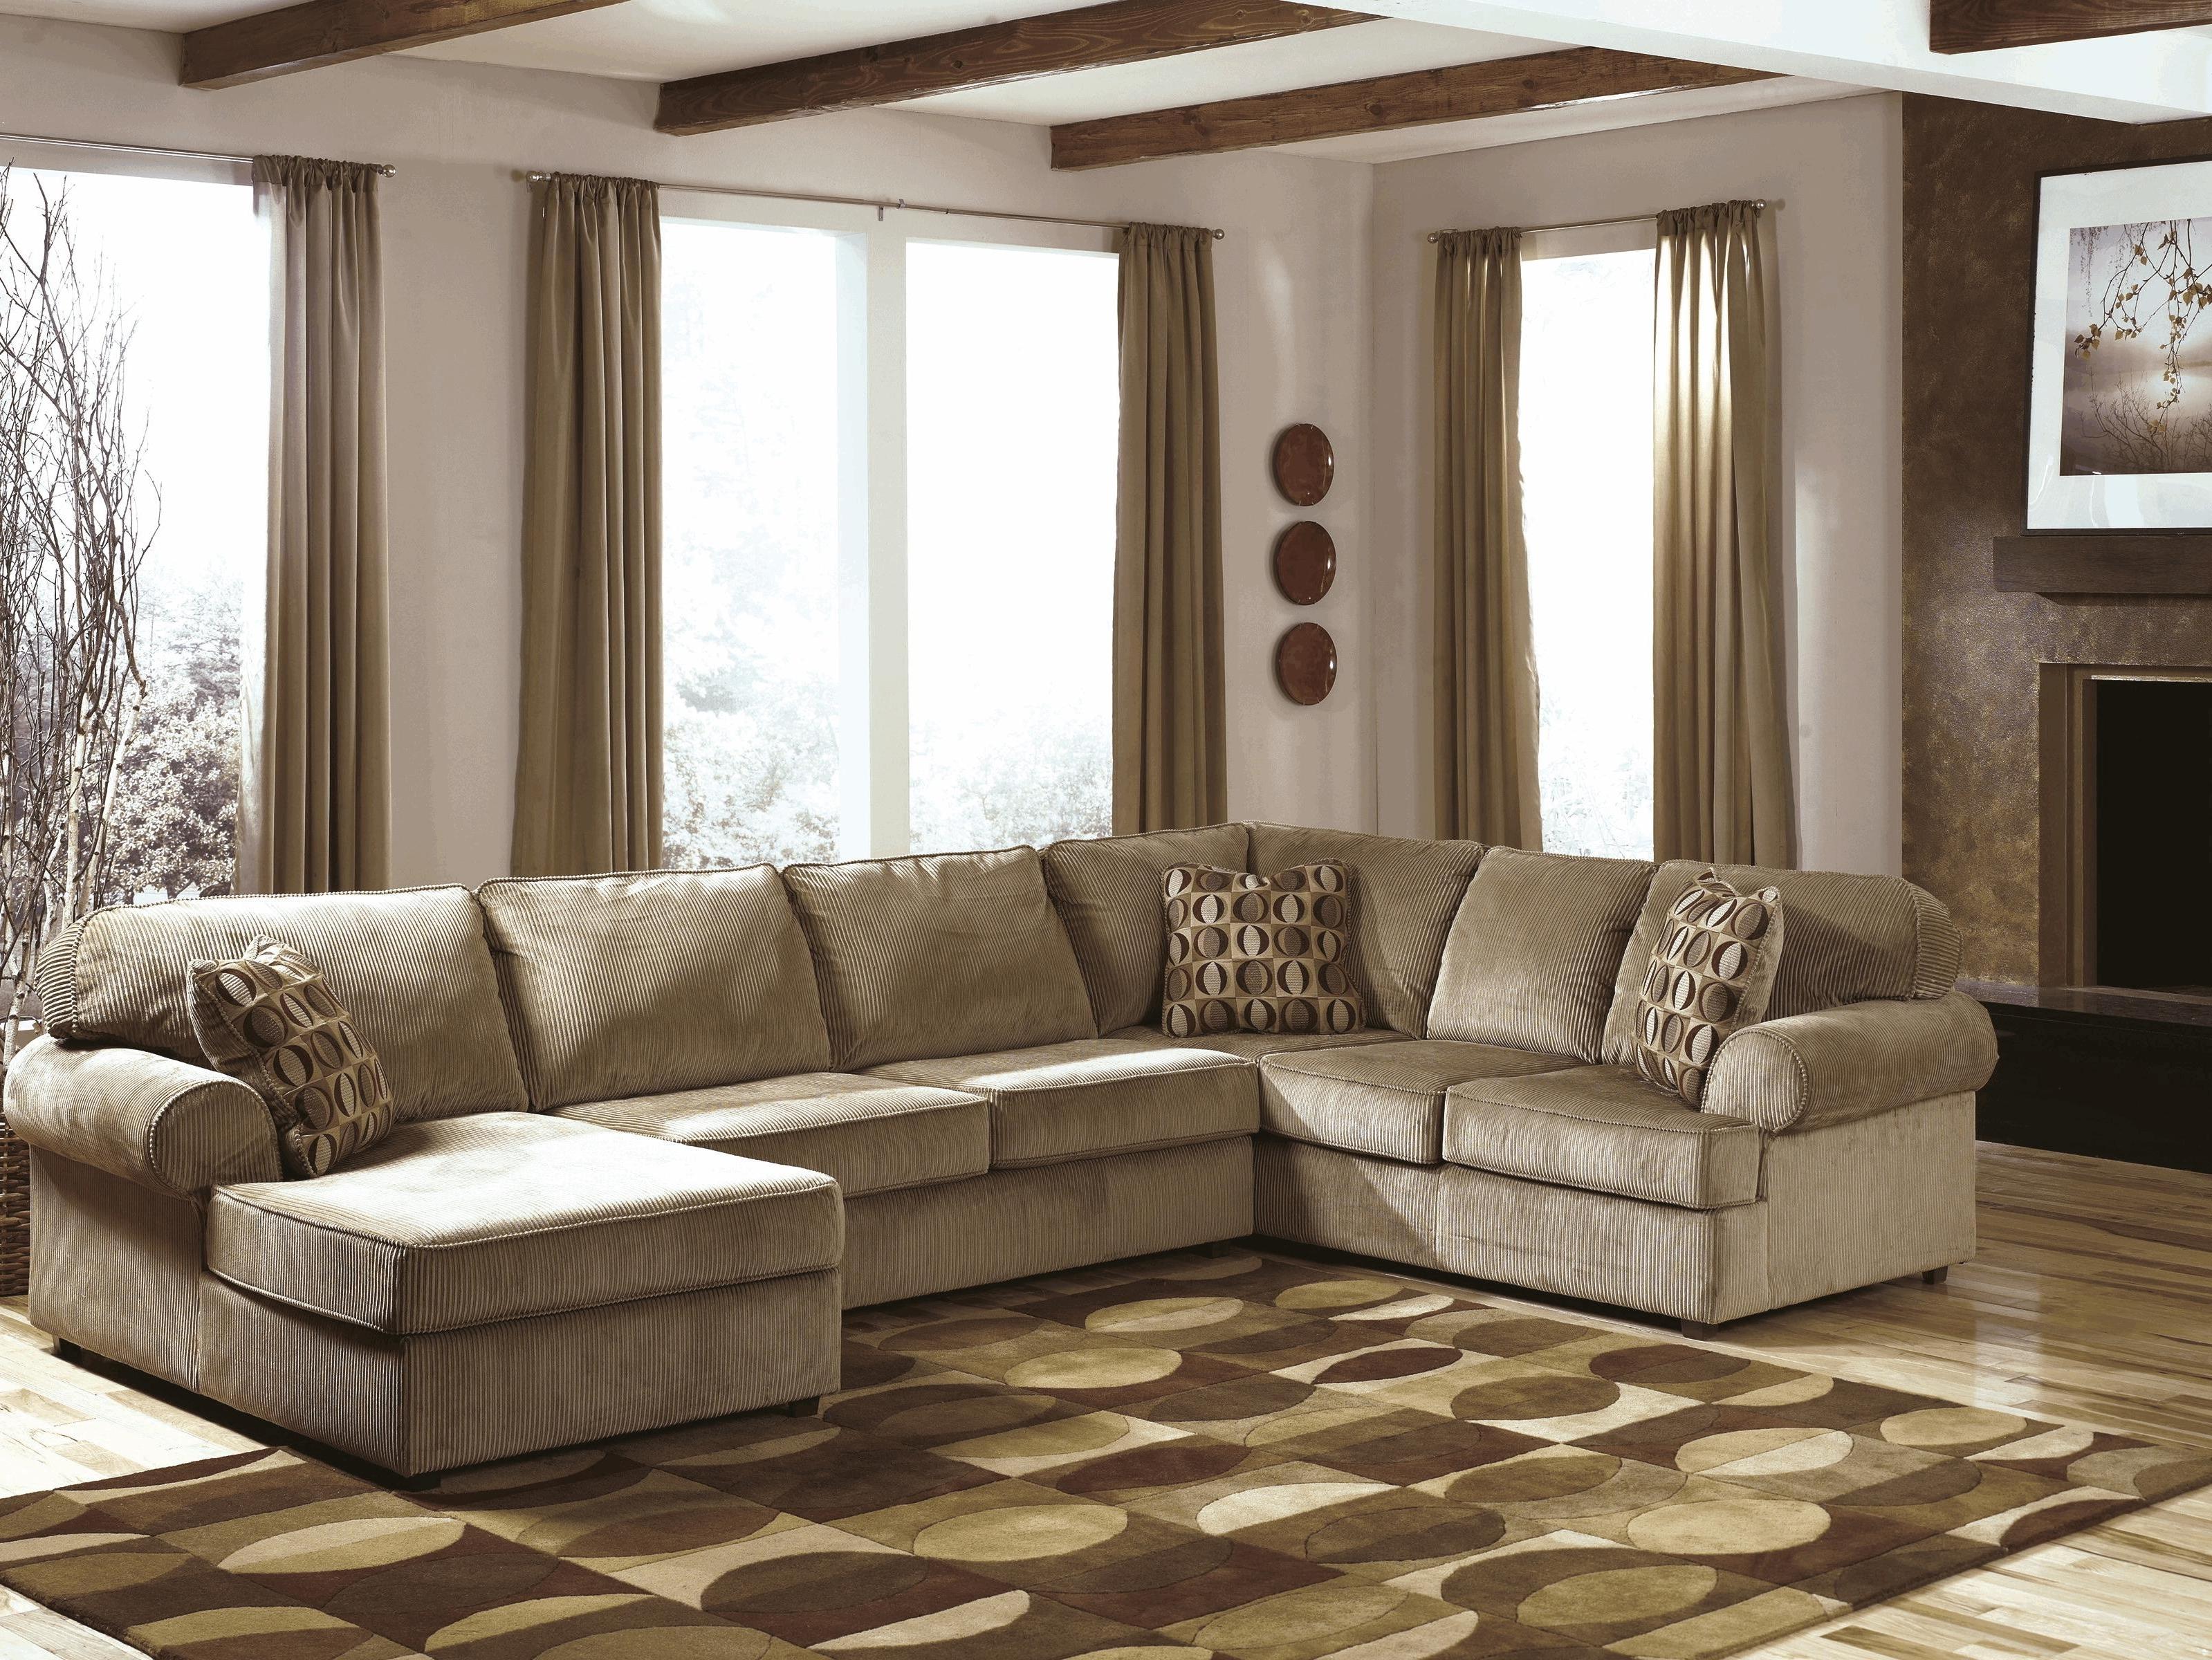 Tufted Leather Sofa Restoration Hardware White Modern Sleeper Regarding Most Popular Restoration Hardware Sectional Sofas (View 13 of 20)